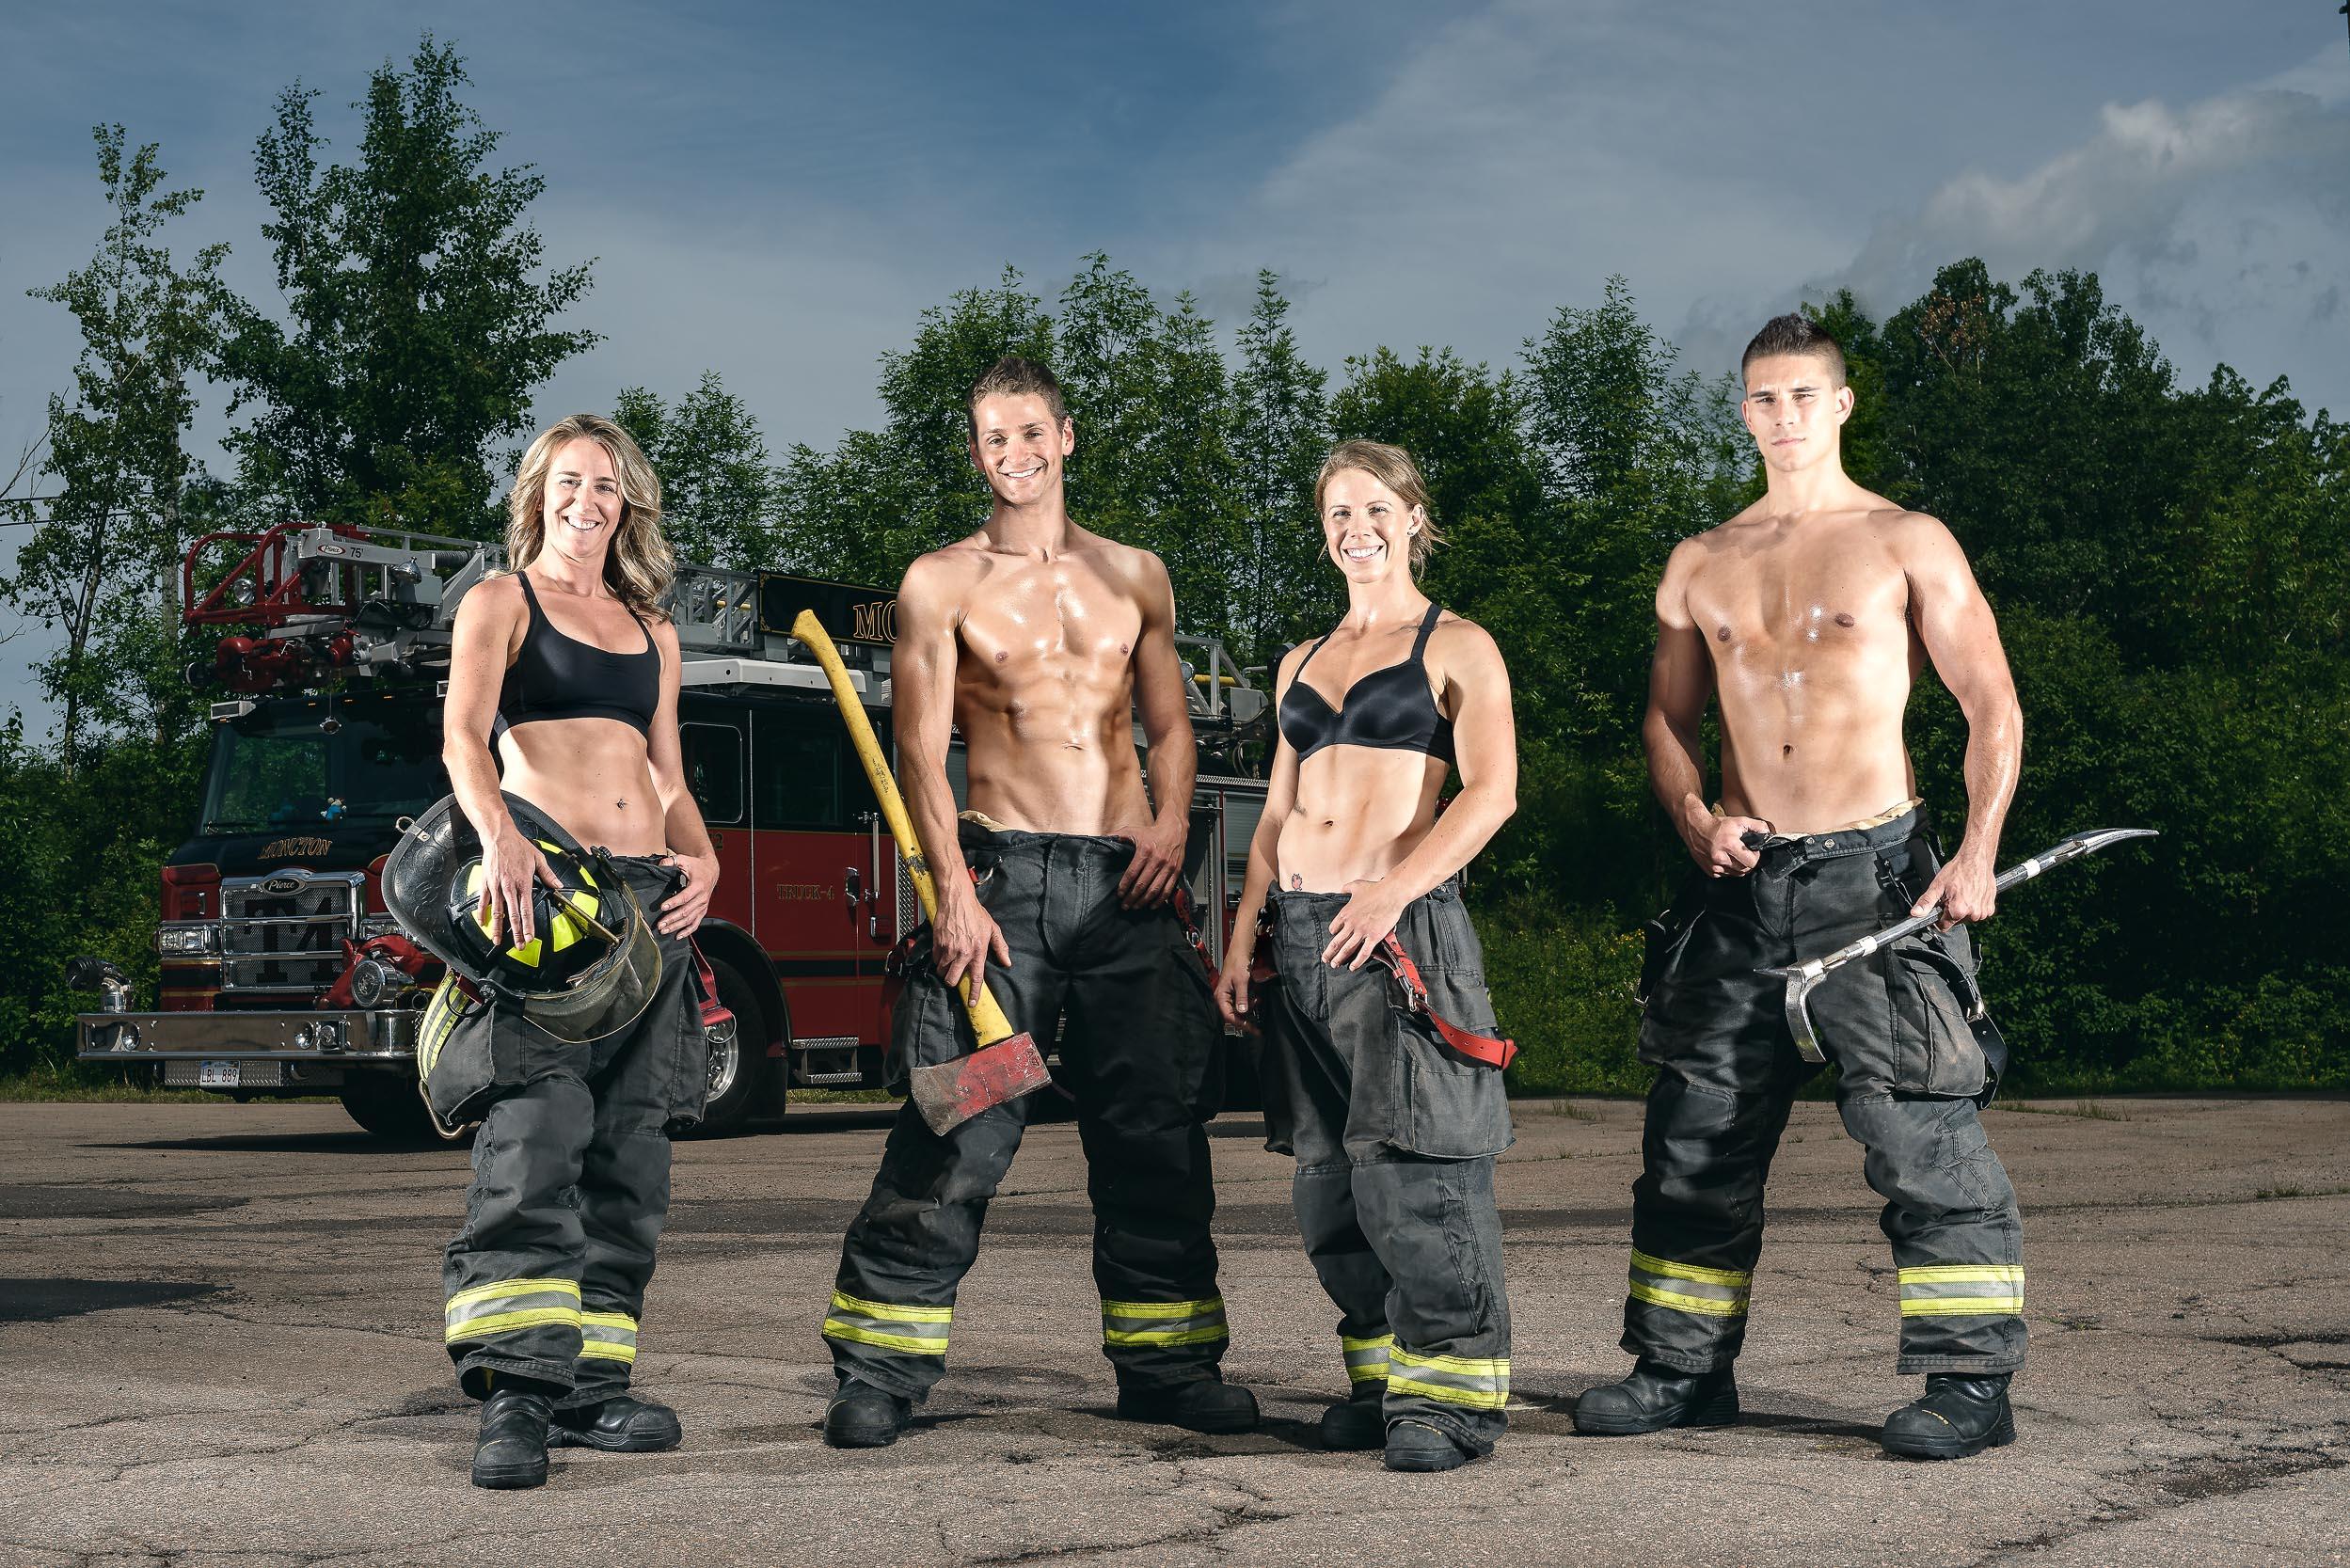 Nigel Fearon Photography | 2016 Moncton Firefighter Calendar-5.jpg